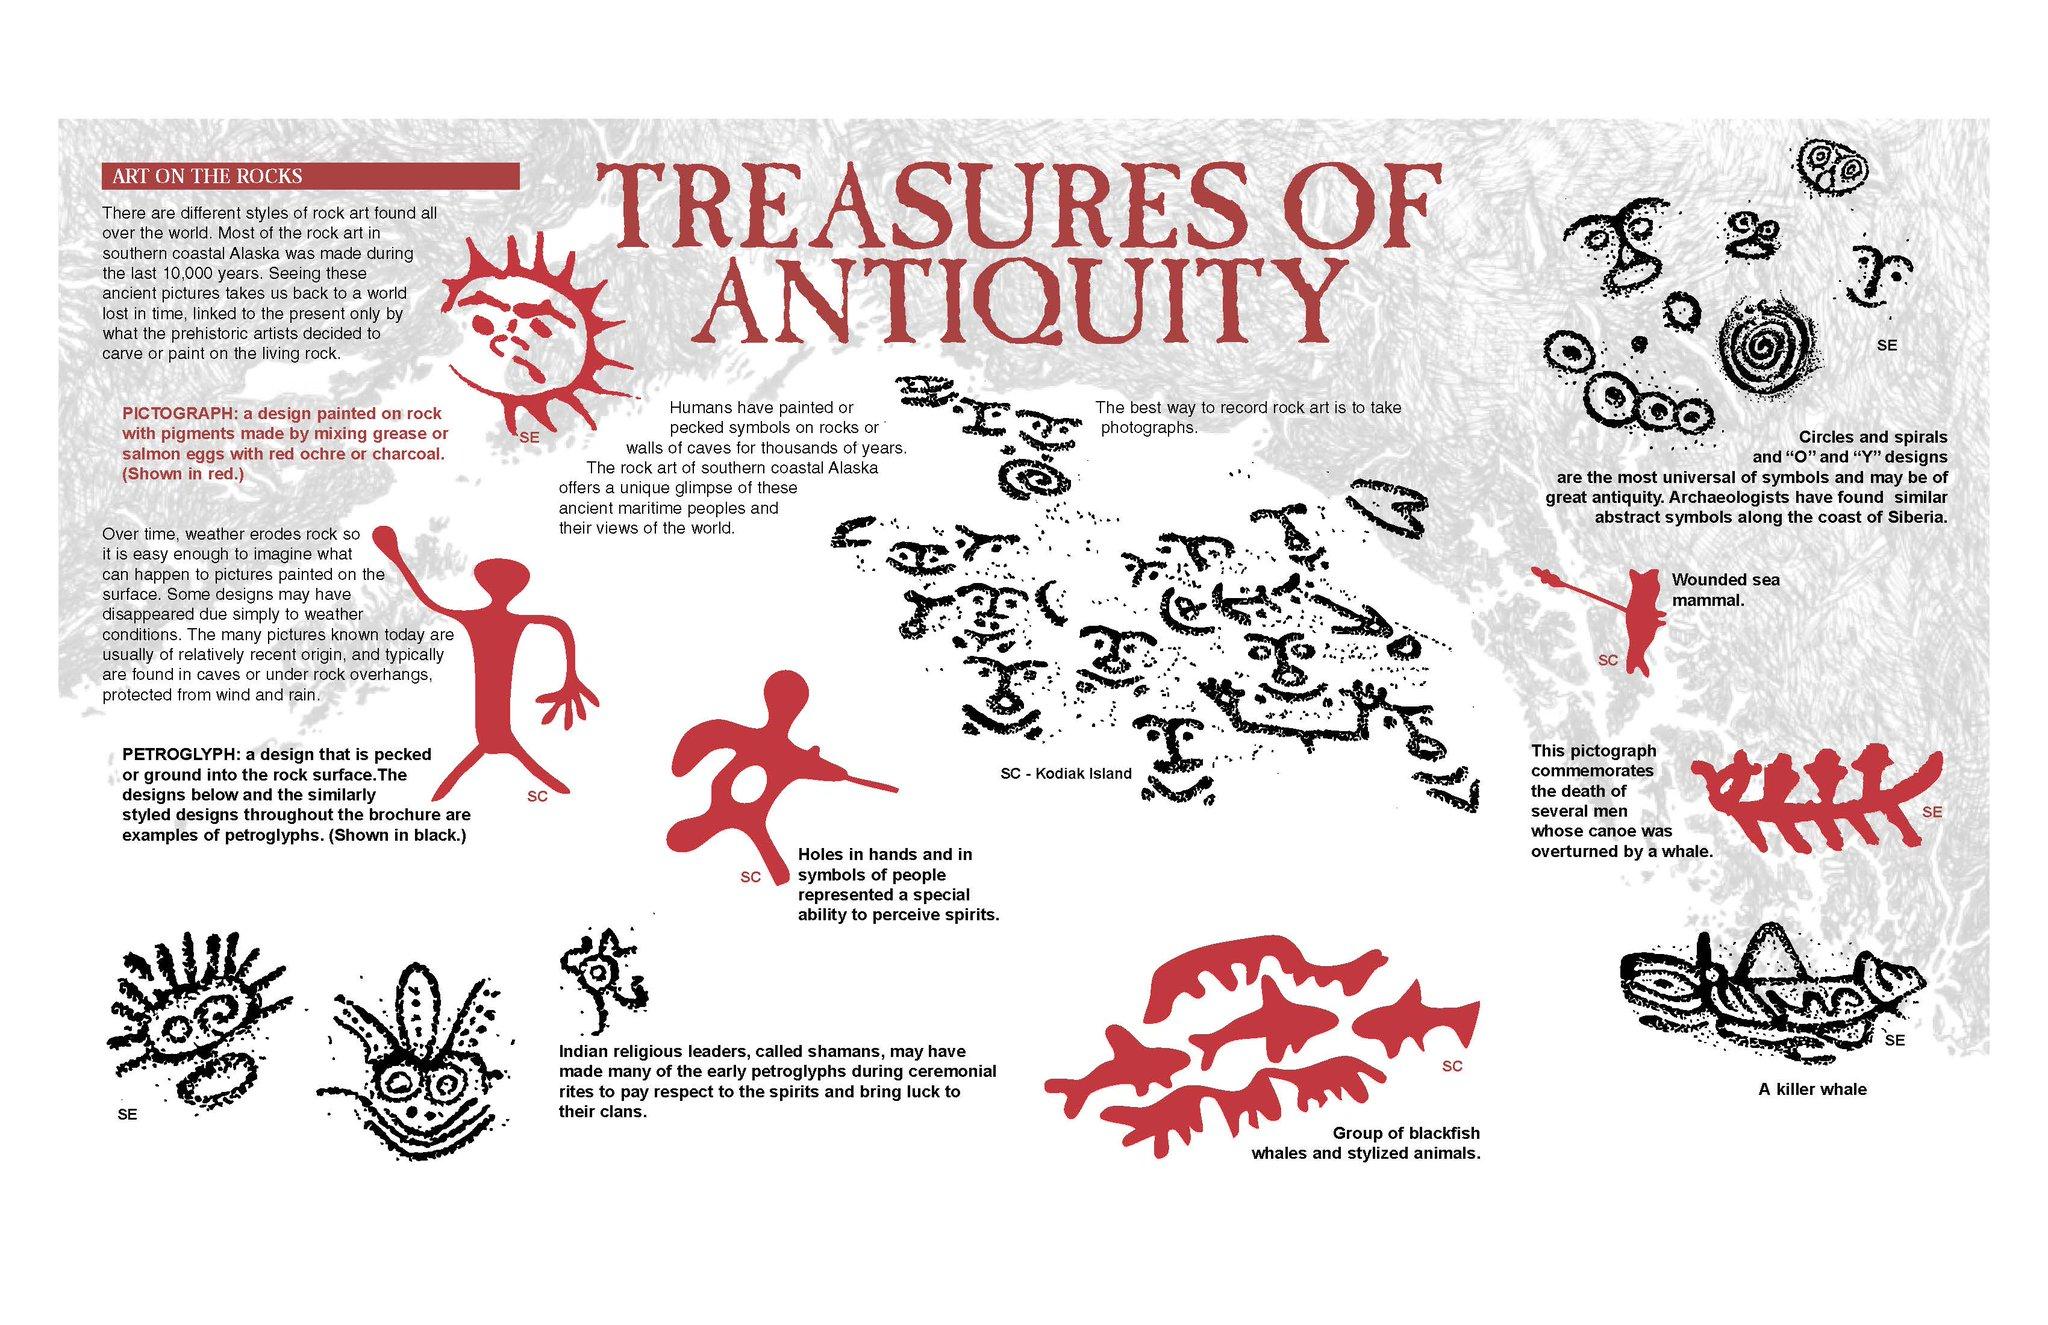 Alaska region on twitter rock art petroglyphs and pictographs of alaska region on twitter rock art petroglyphs and pictographs of southern coastal alaska tribalrelations worldforests nativefed biocorpaavc Image collections